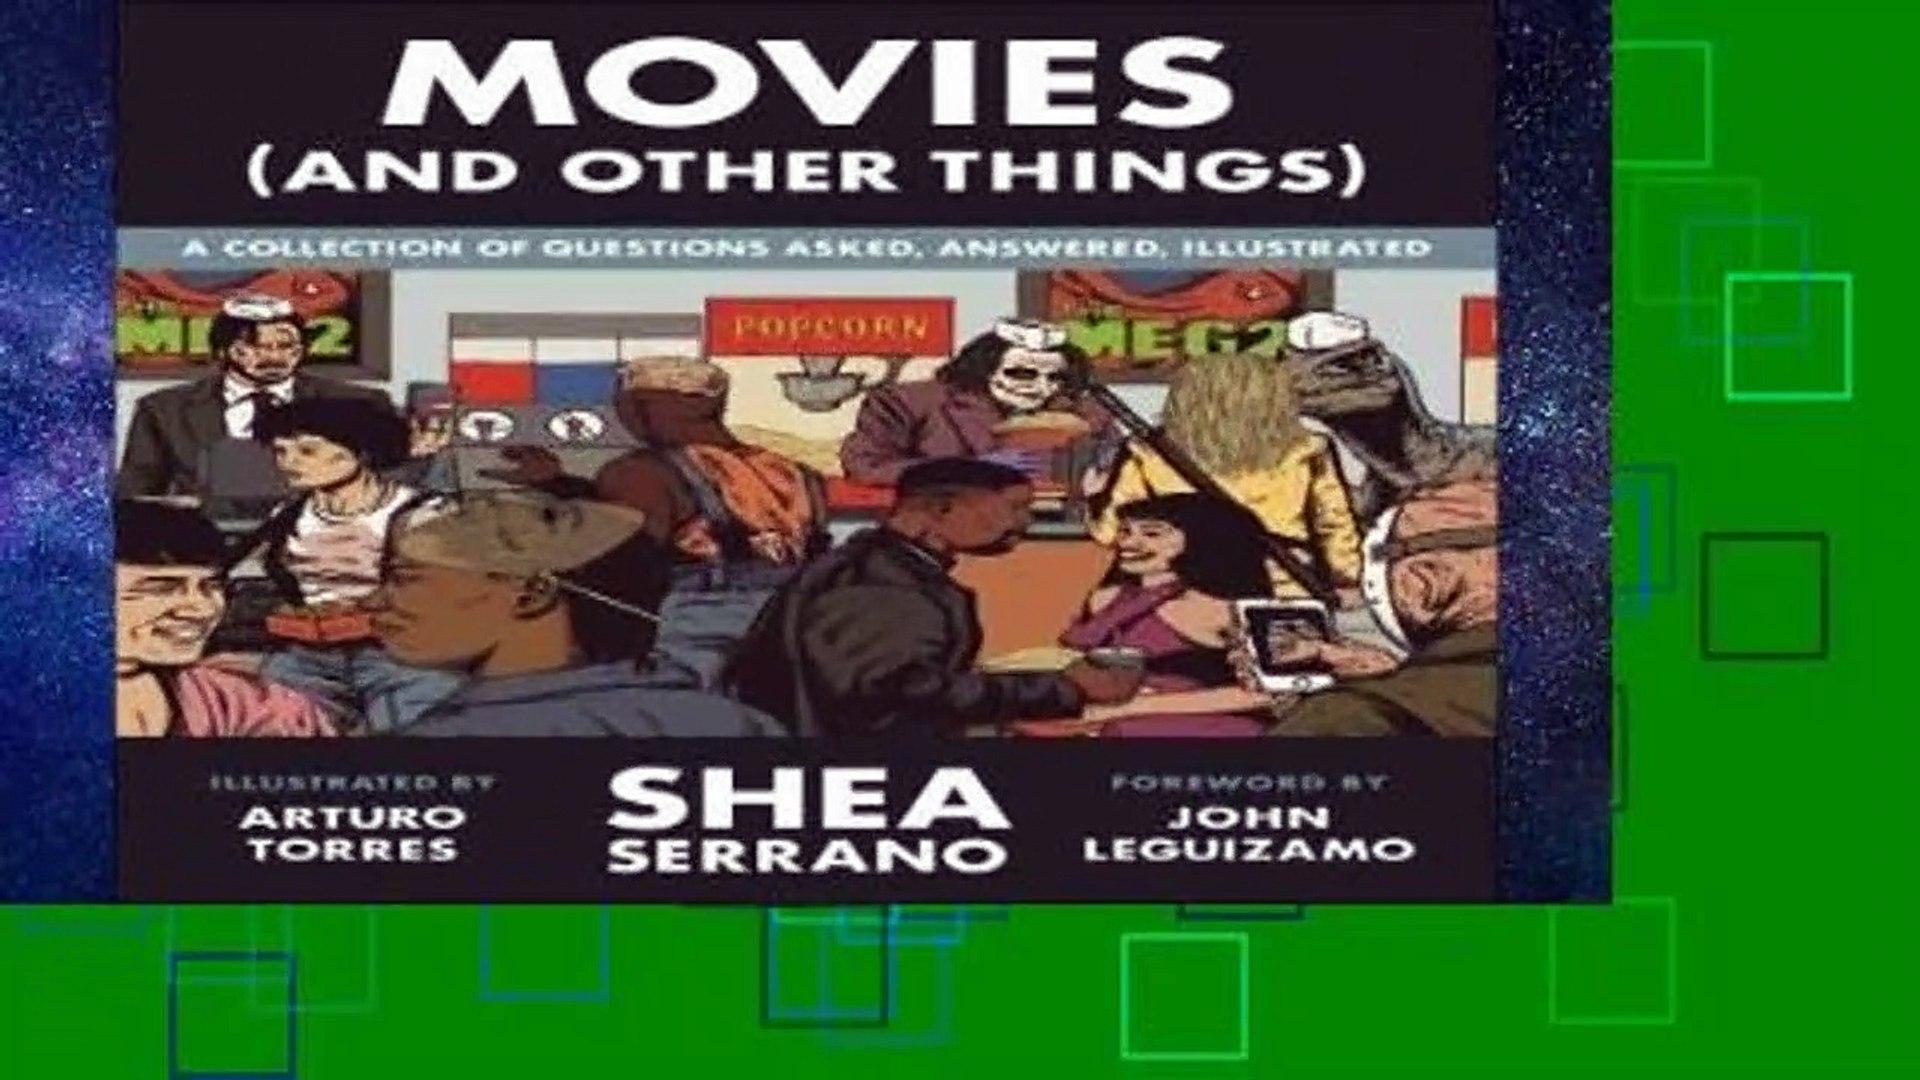 R.E.A.D Movies (And Other Things) D.O.W.N.L.O.A.D